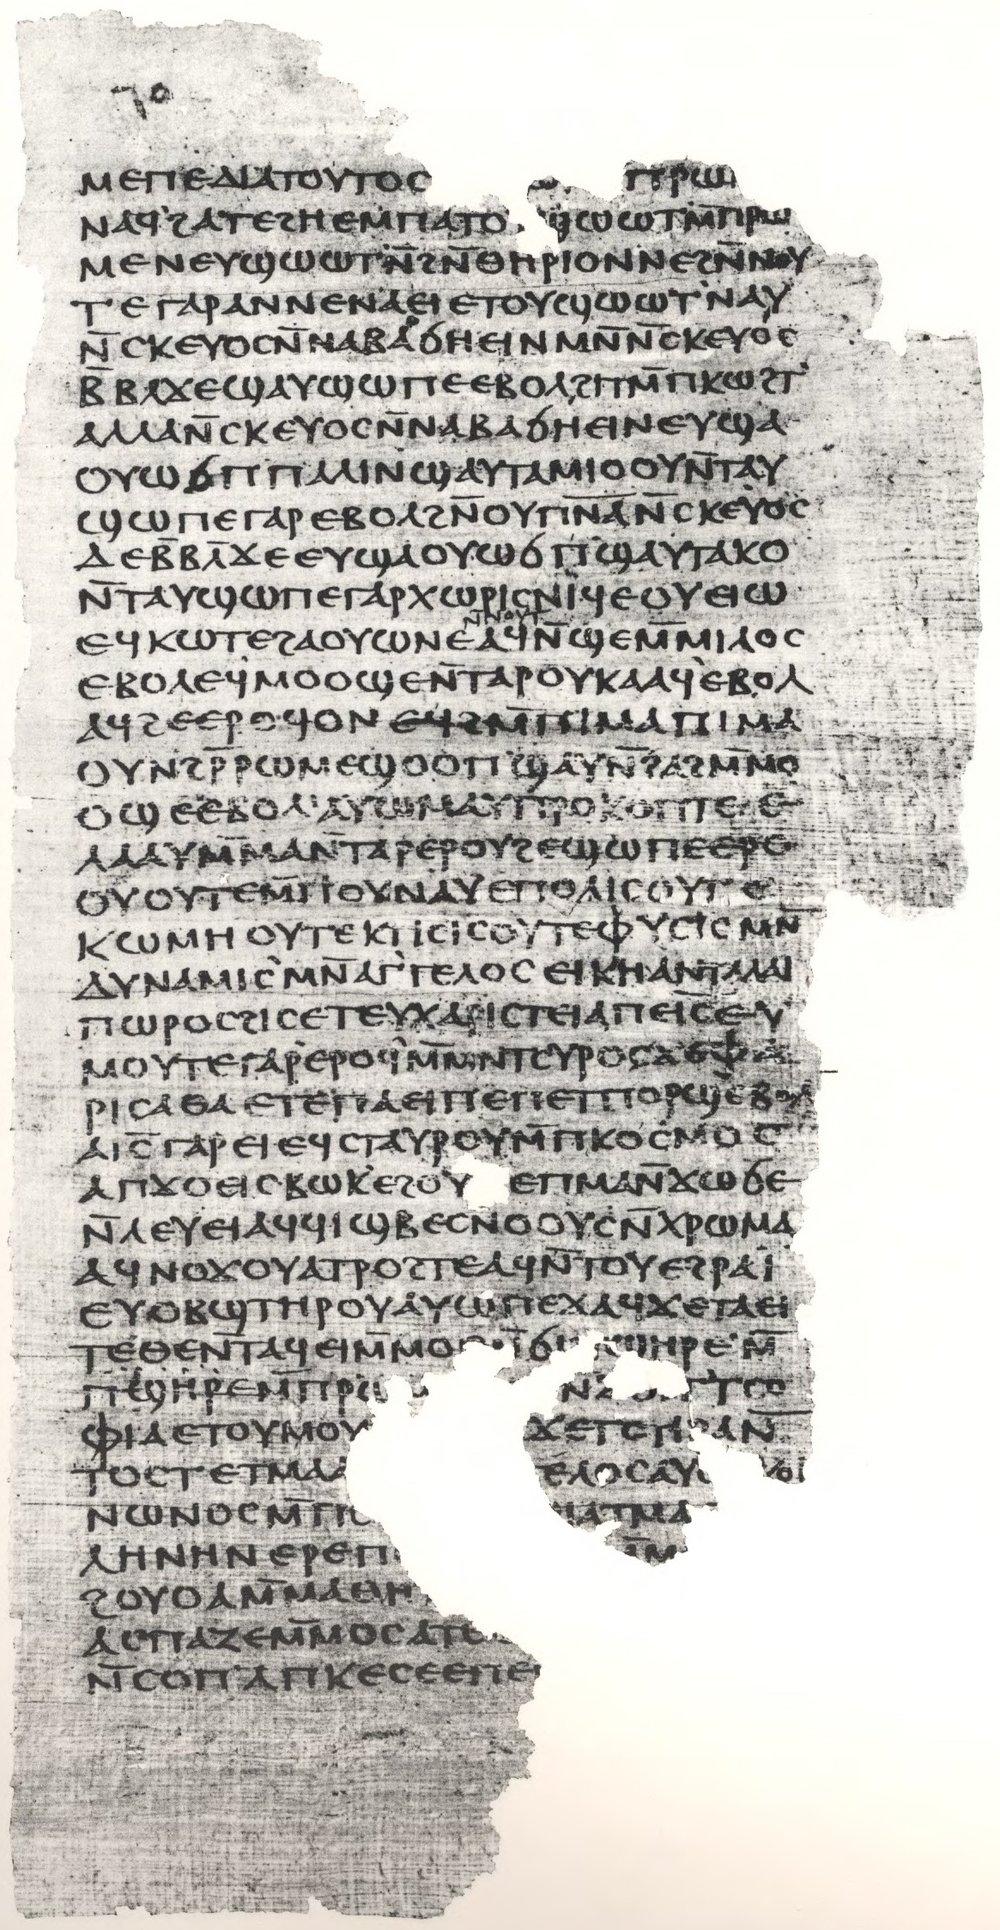 Gospel_of_Philip_facsimile_Page_63.jpg